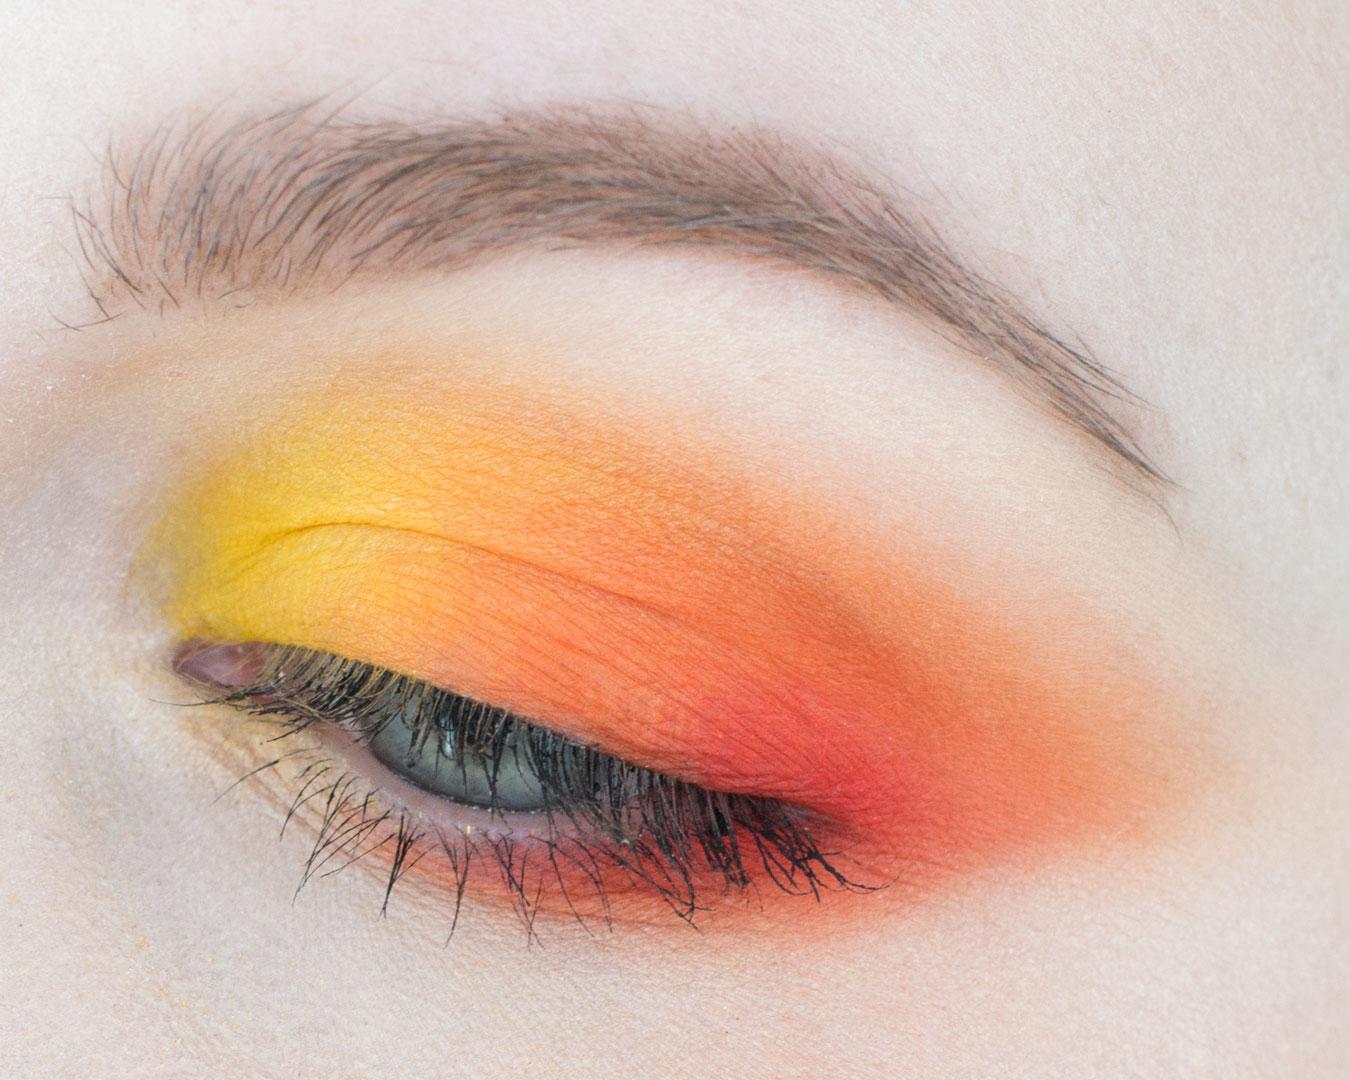 analogous-red-yellow-orange2.jpg